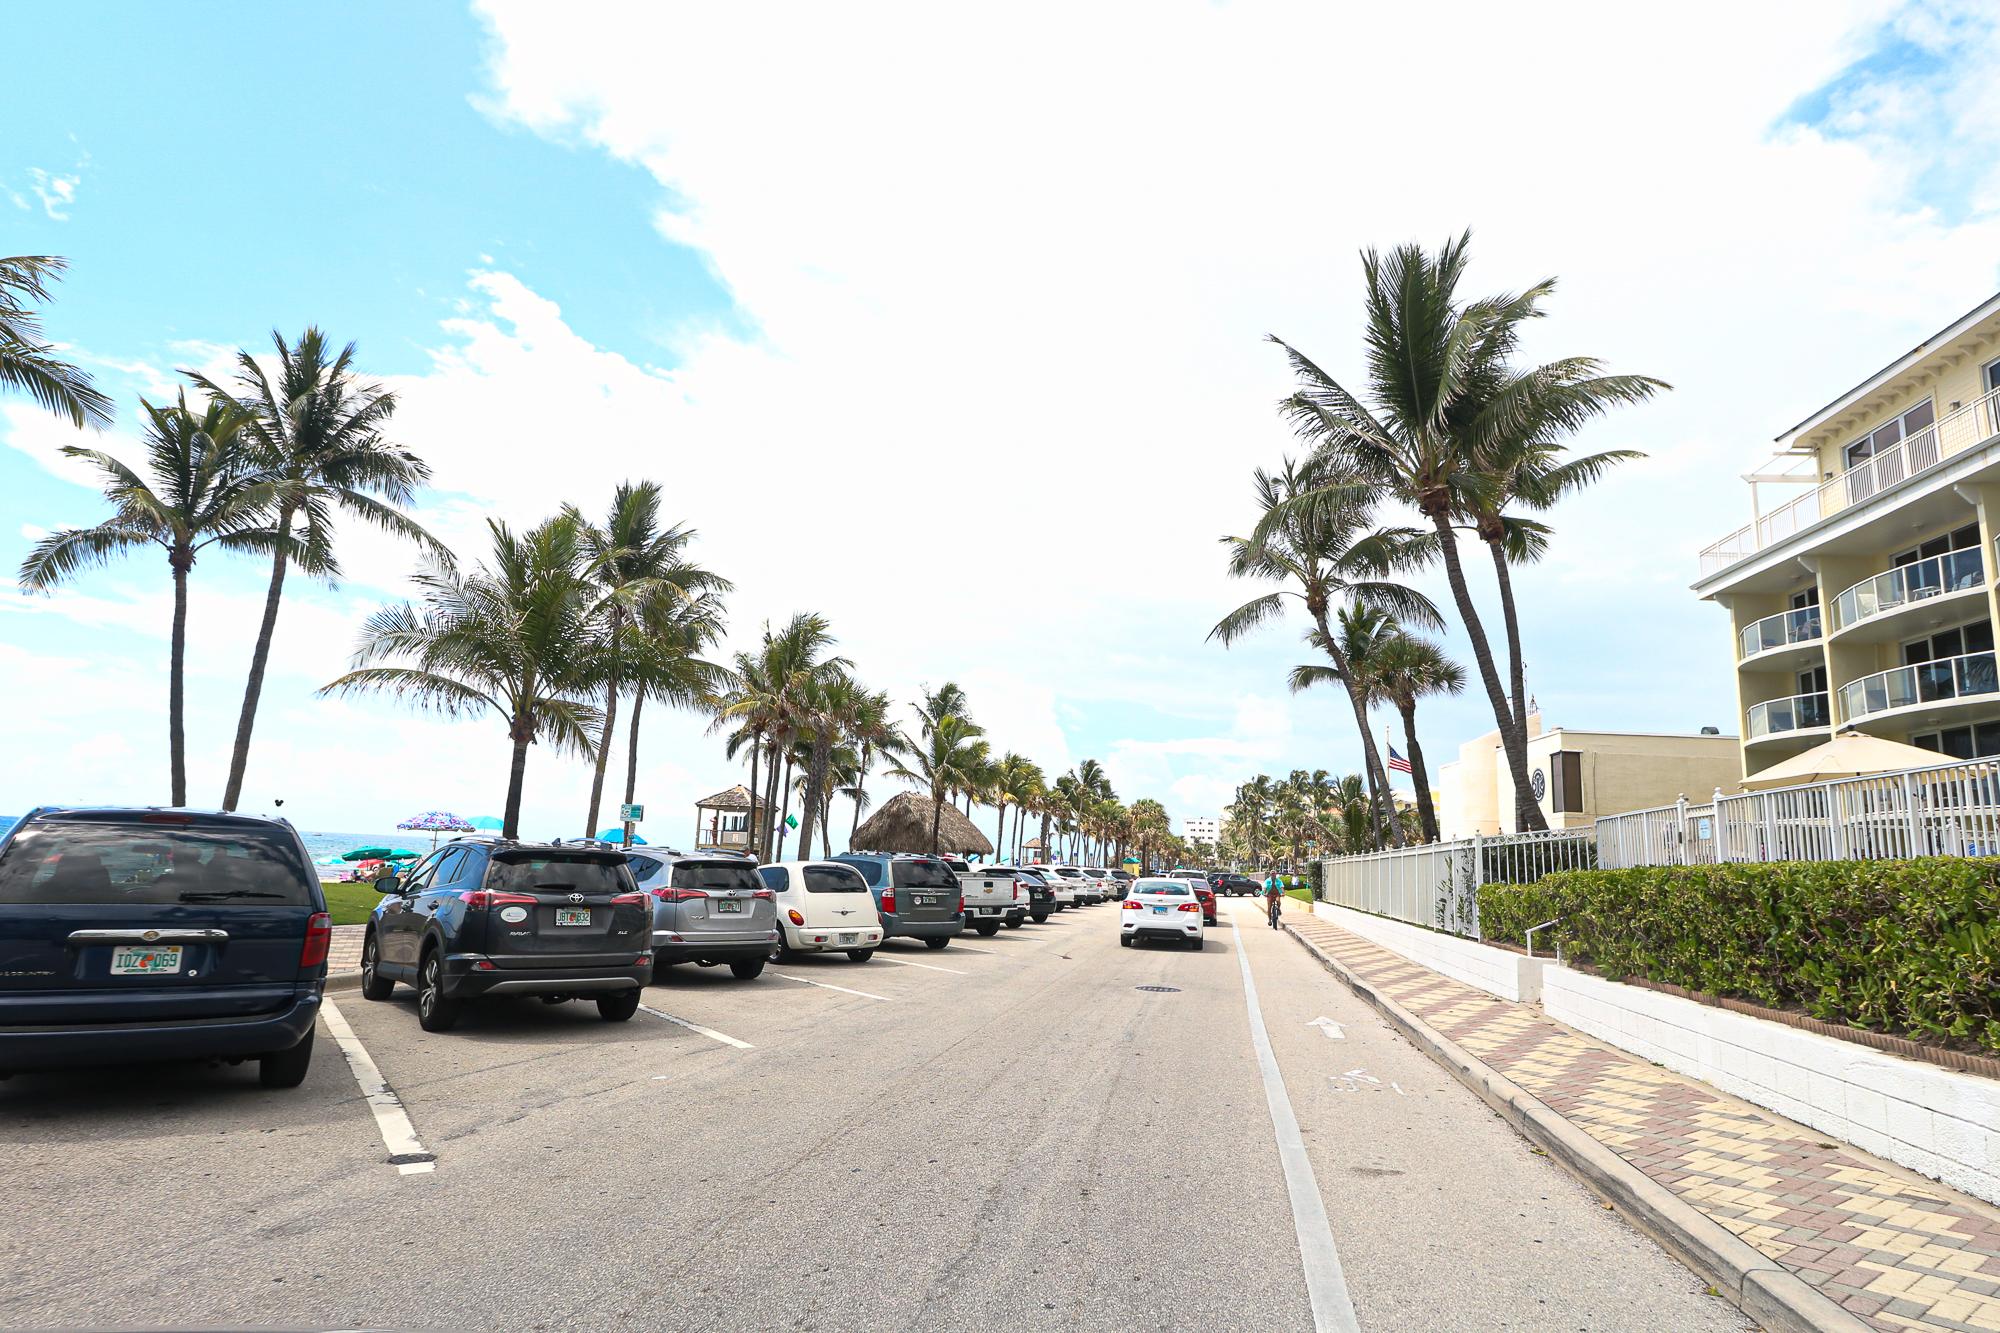 Atlantique Beach House Hotel - Single #10 photo 20393392